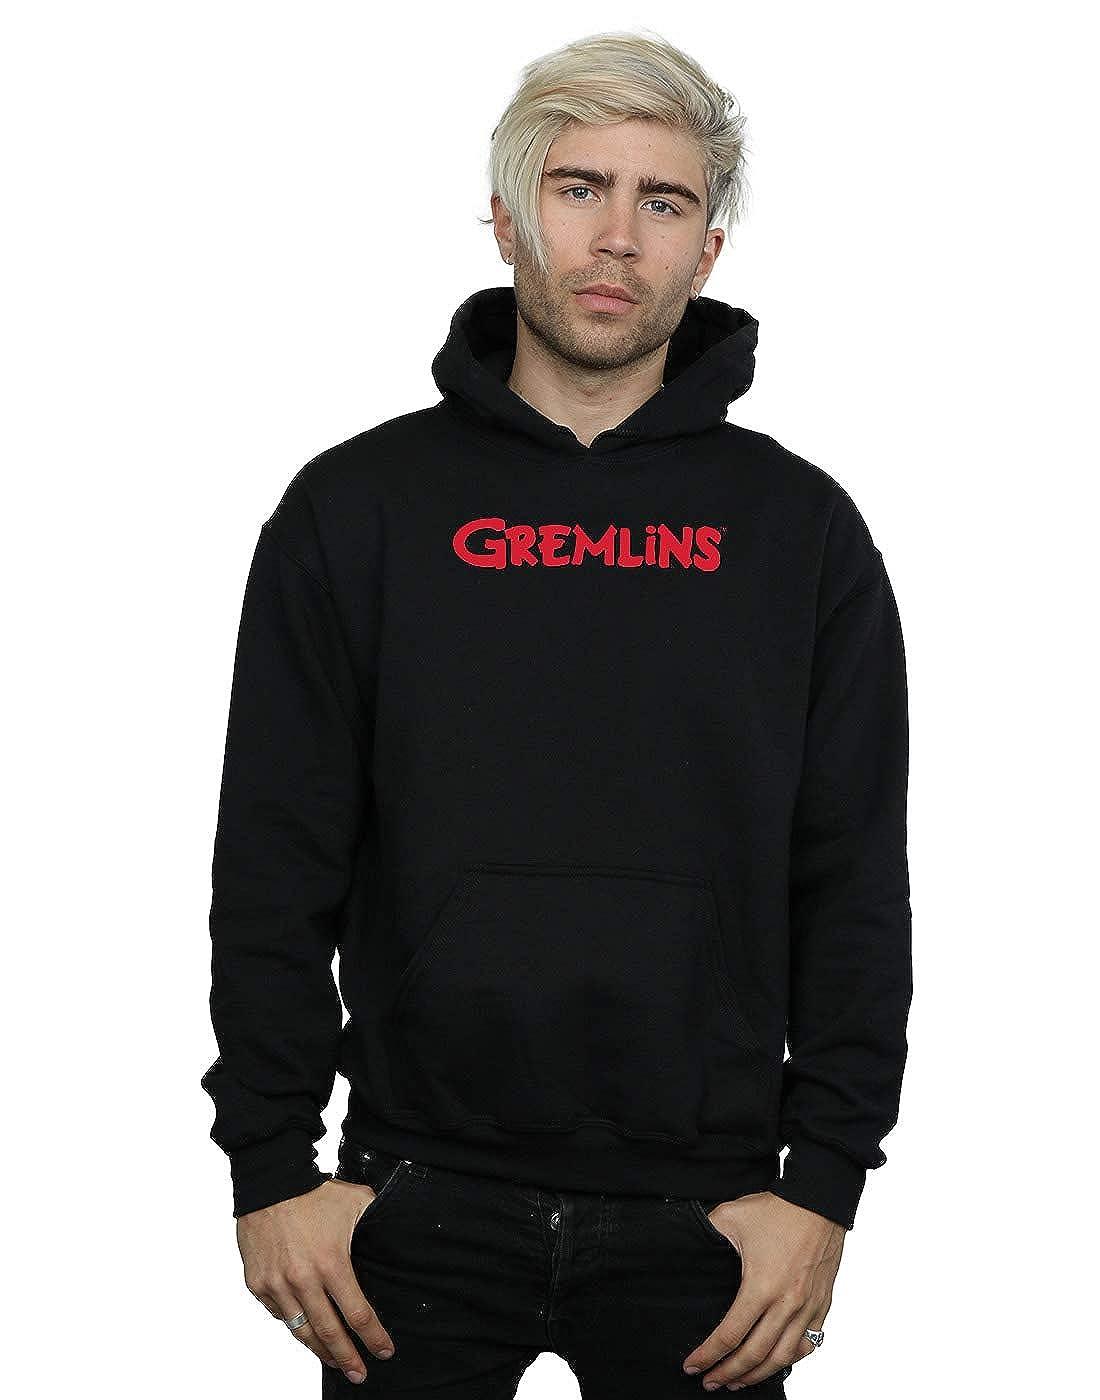 Absolute Cult Gremlins Herren Text Logo Kapuzenpullover